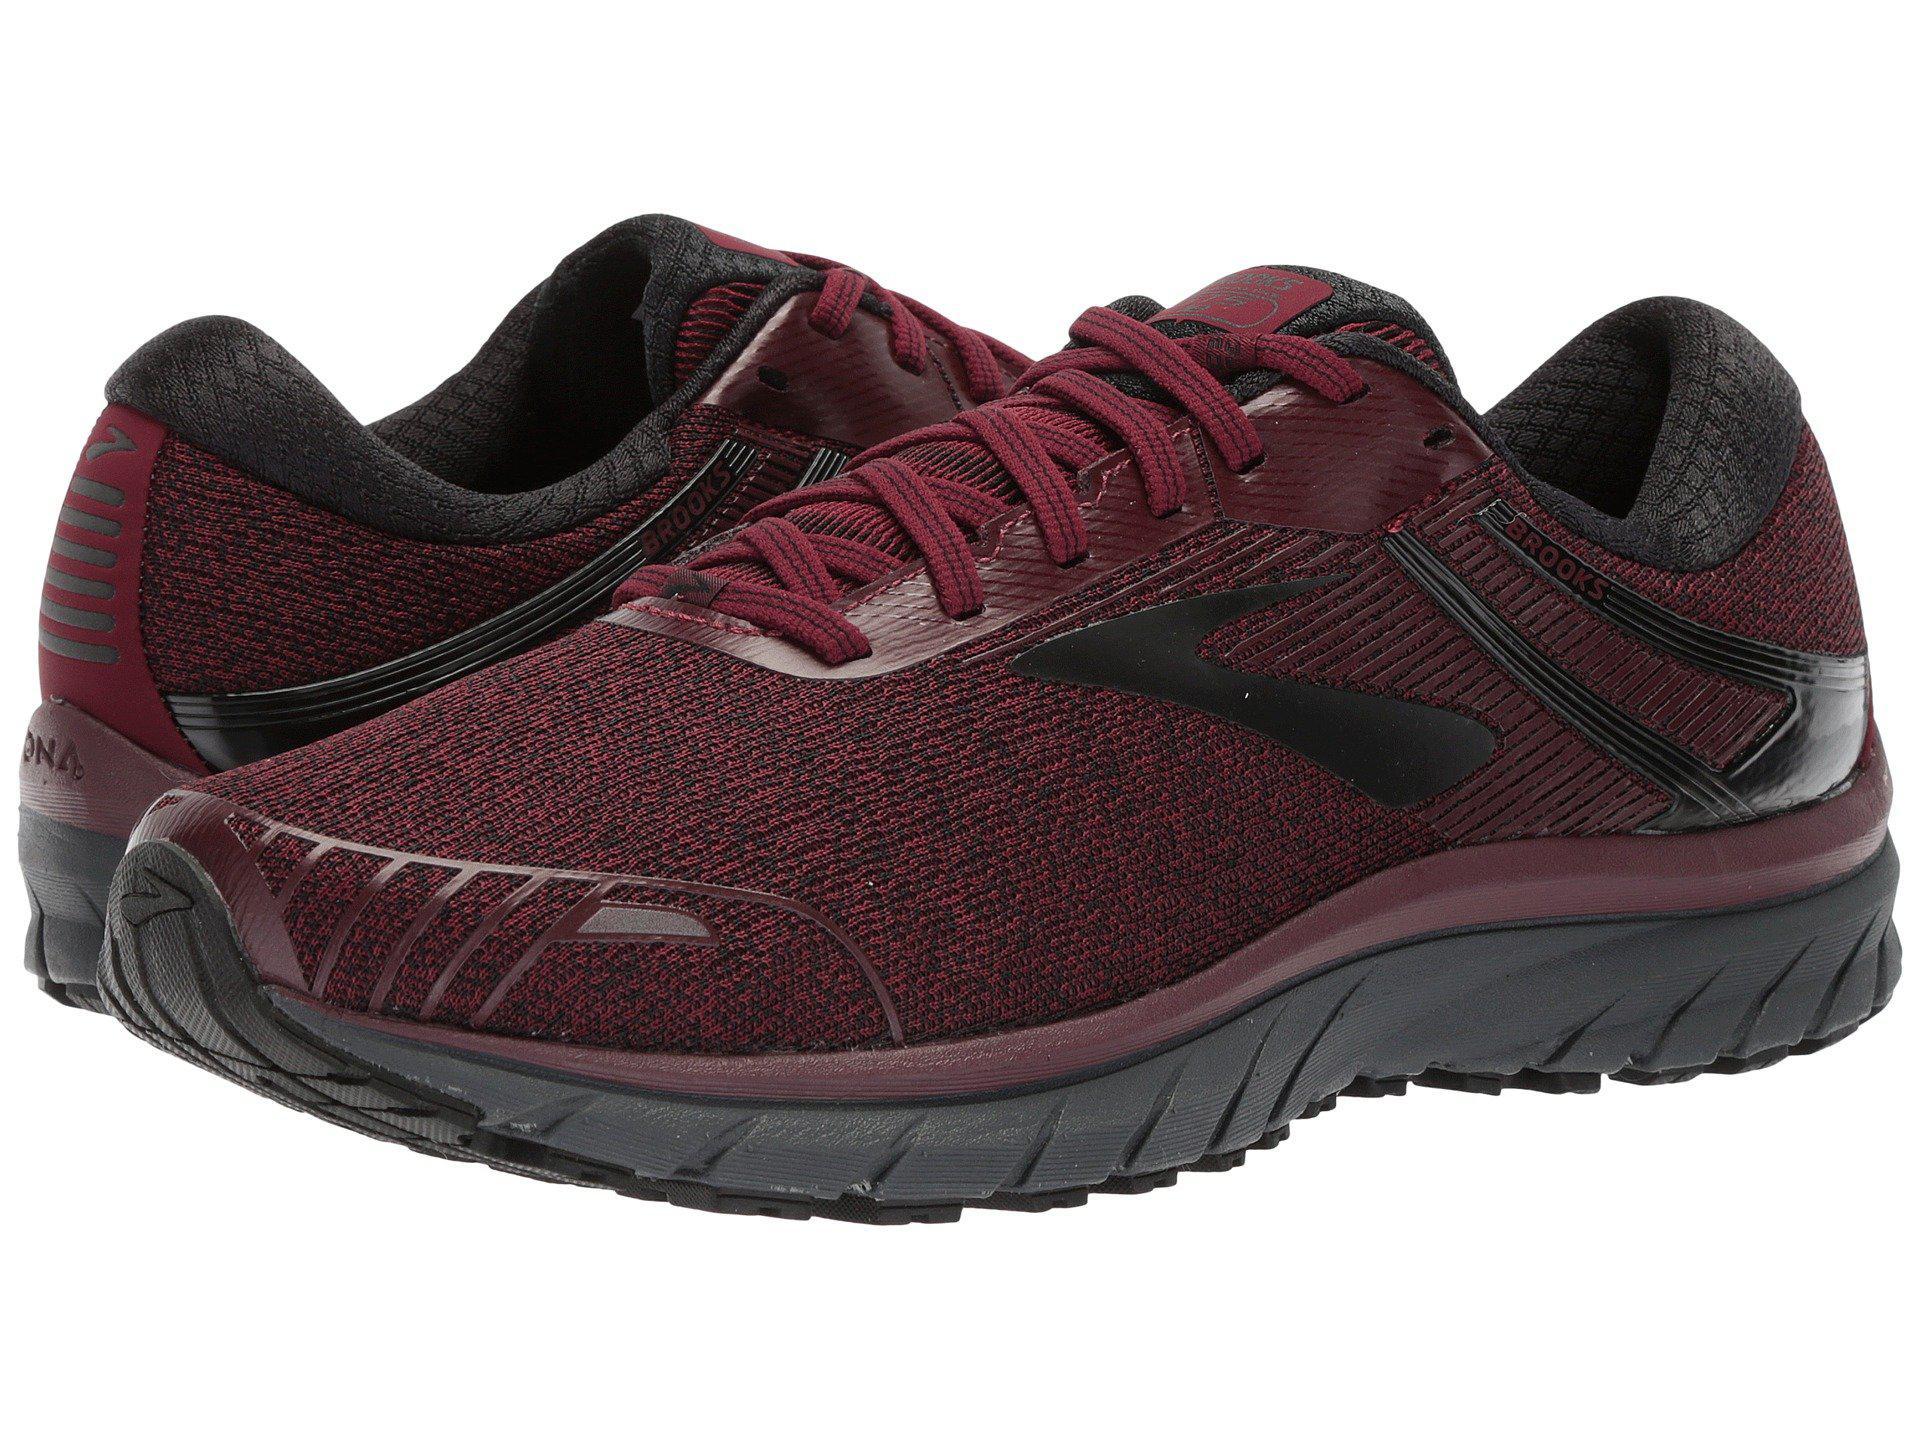 5b603320f779 Lyst - Brooks Adrenaline Gts 18 (black gold red) Men s Running Shoes ...